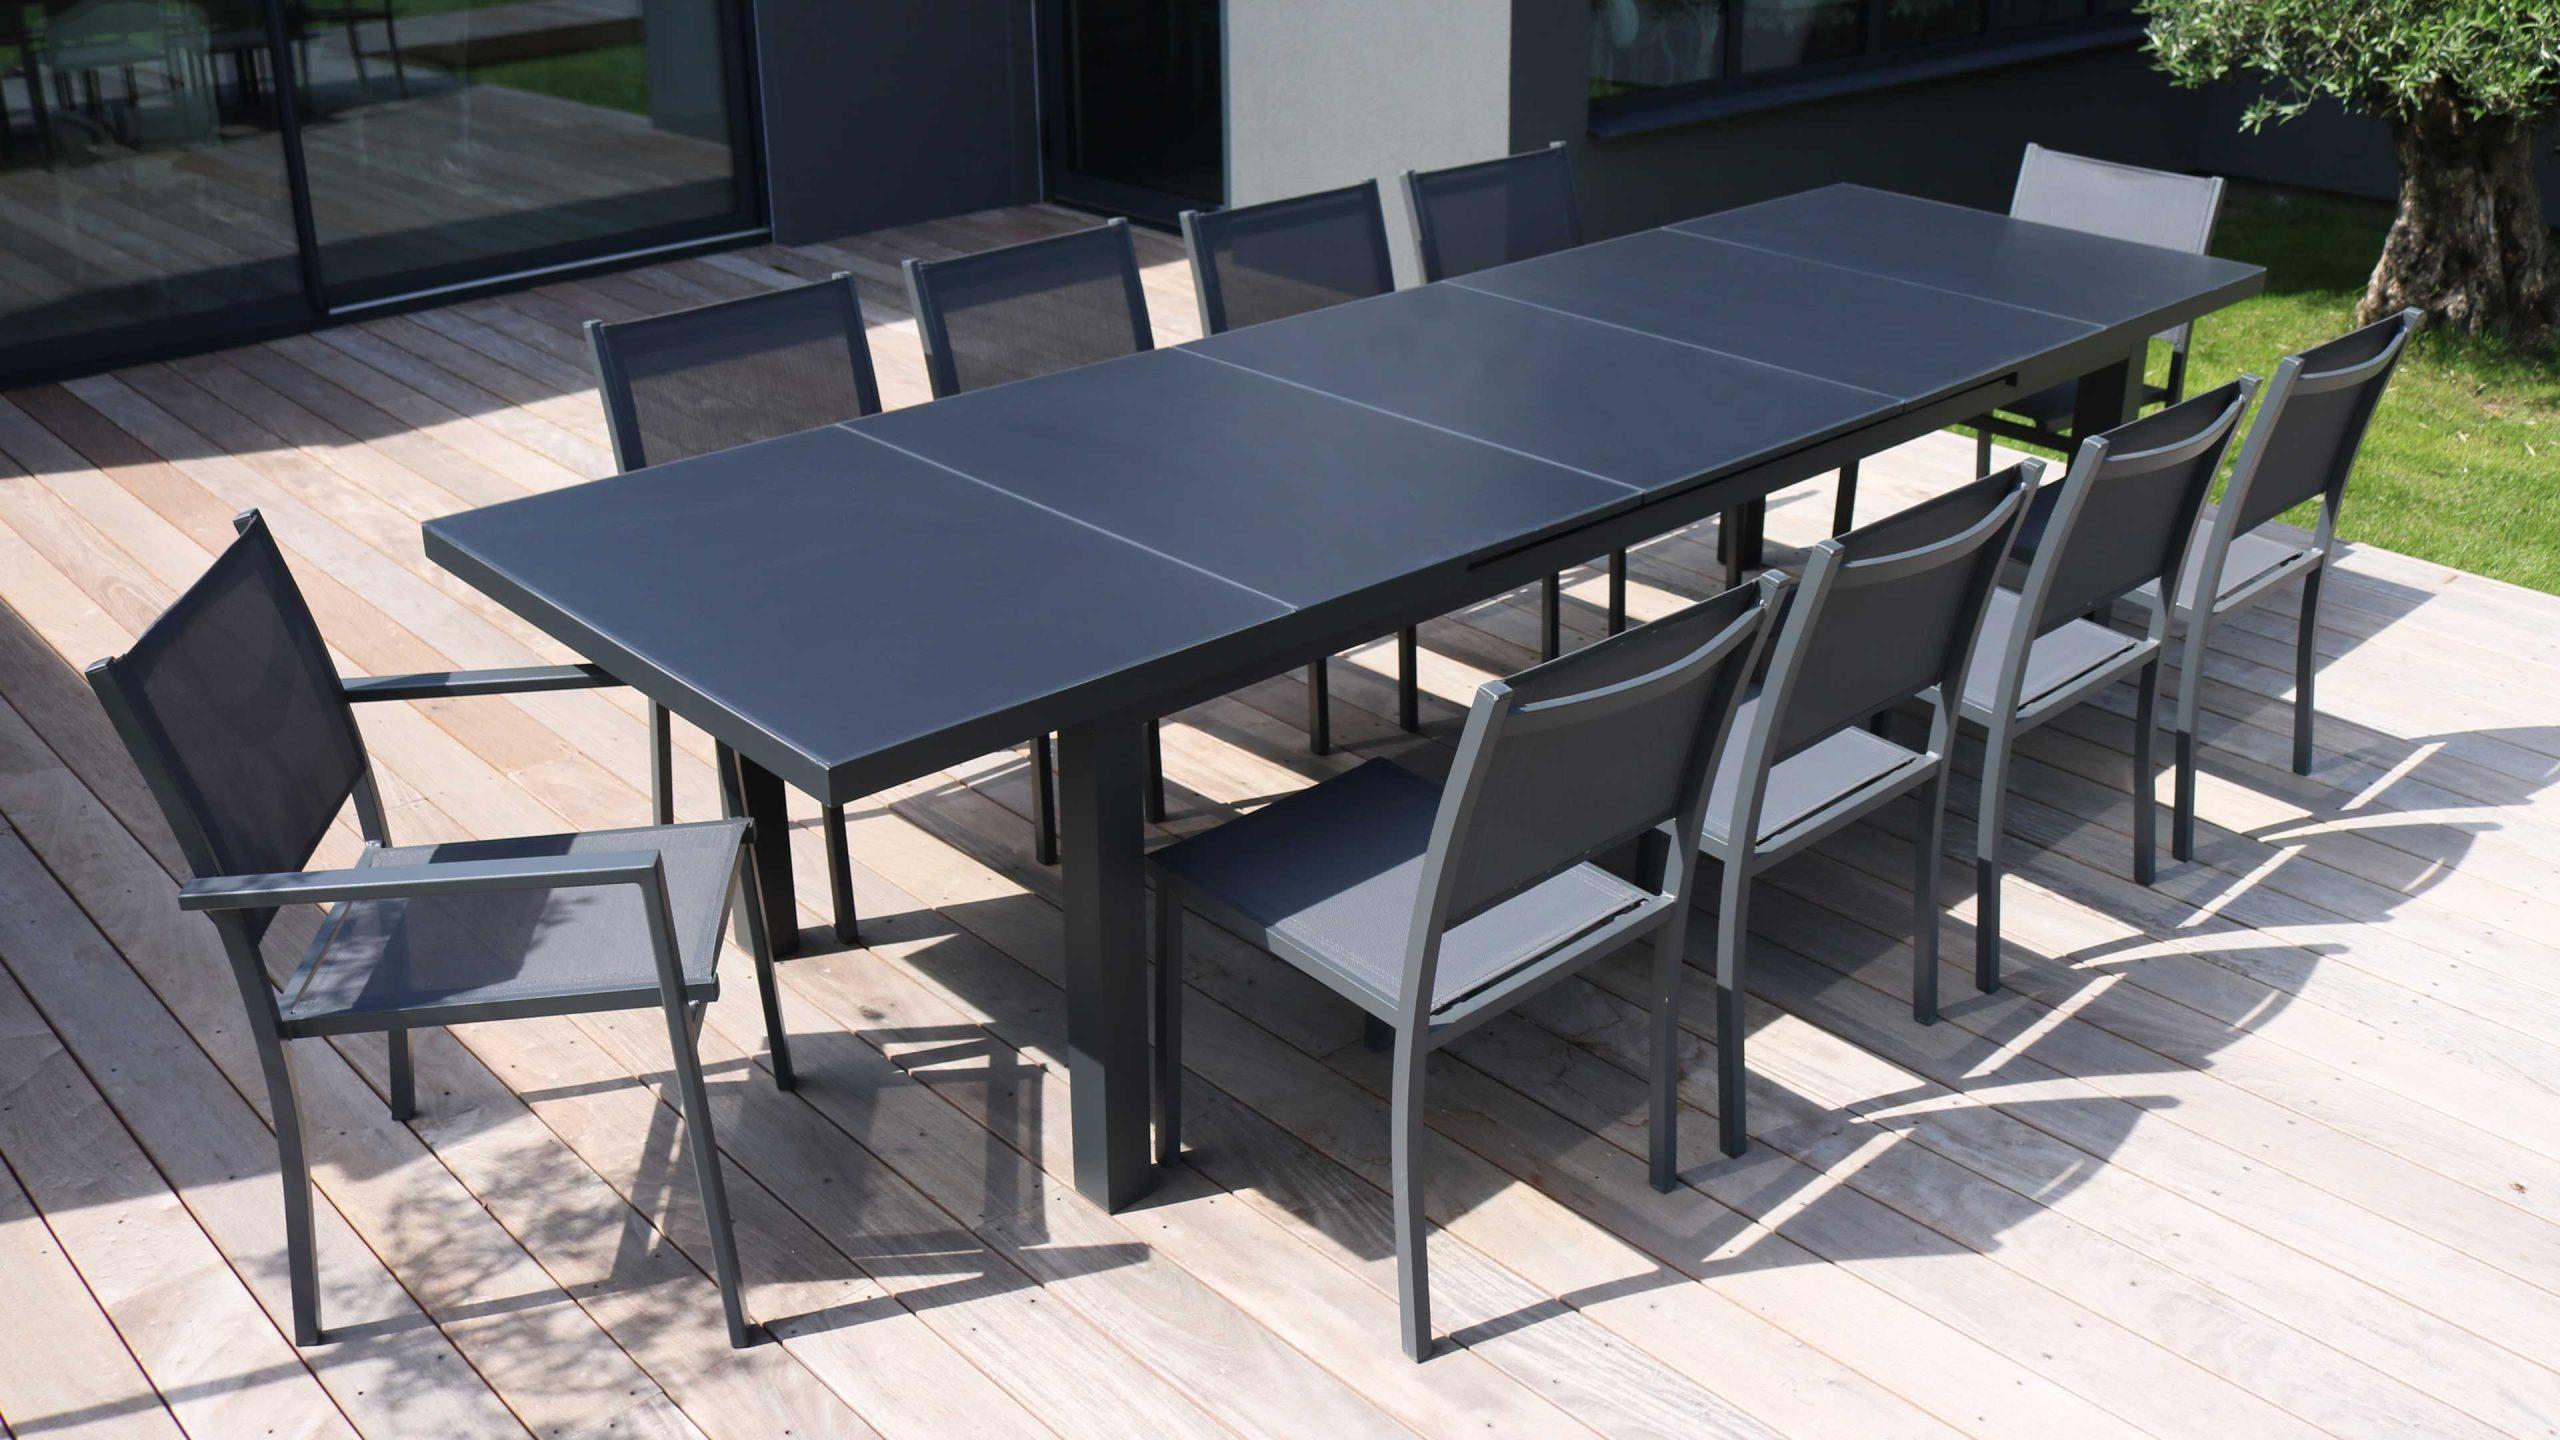 Table Jardin Extensible Rallonge Aluminium 256/320Cm 12 Places encequiconcerne Table Jardin Aluminium Avec Rallonge